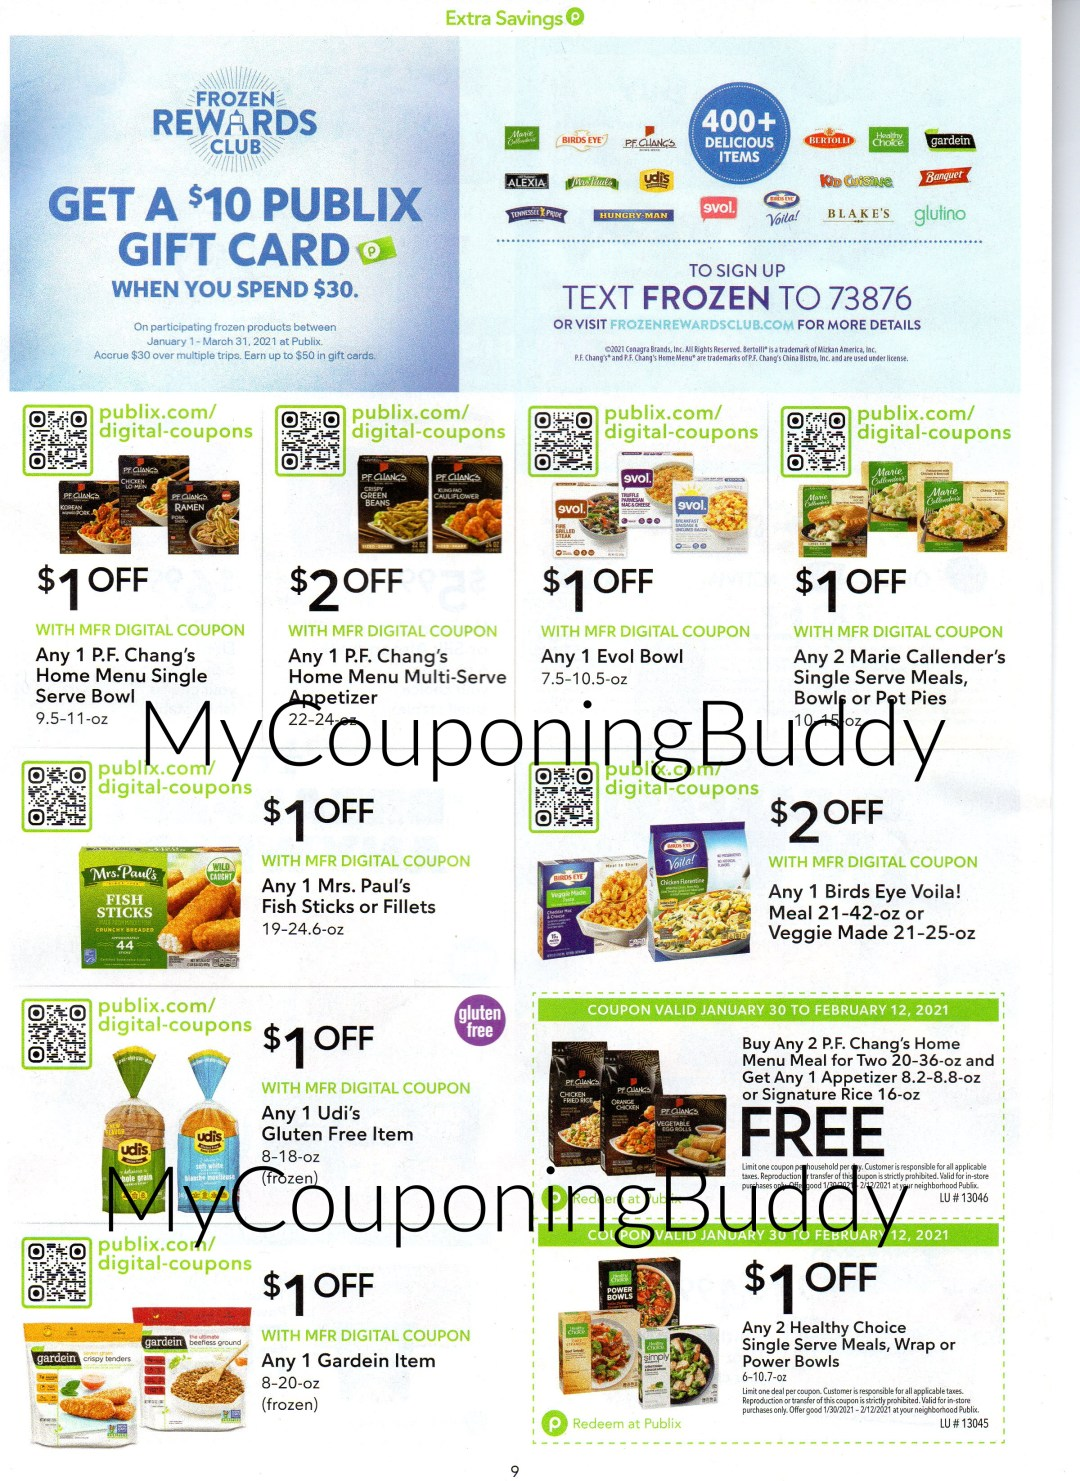 (Publix Coupon) Extra Savings Flyer (valid 1/30/21-2/12/21